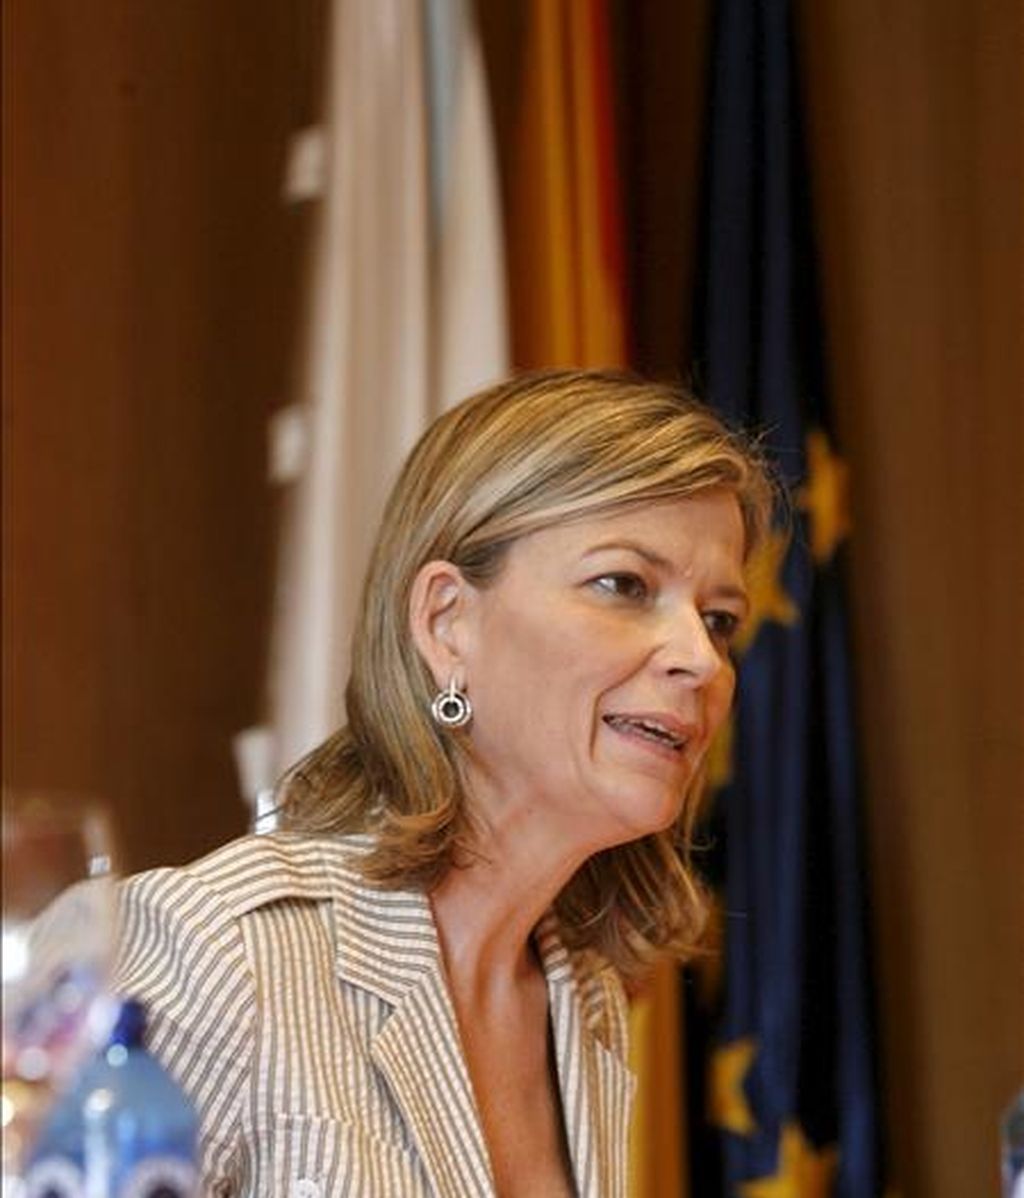 La vocal portavoz del Consejo General del Poder Judicial (CGPJ), Gabriela Bravo. EFE/Archivo